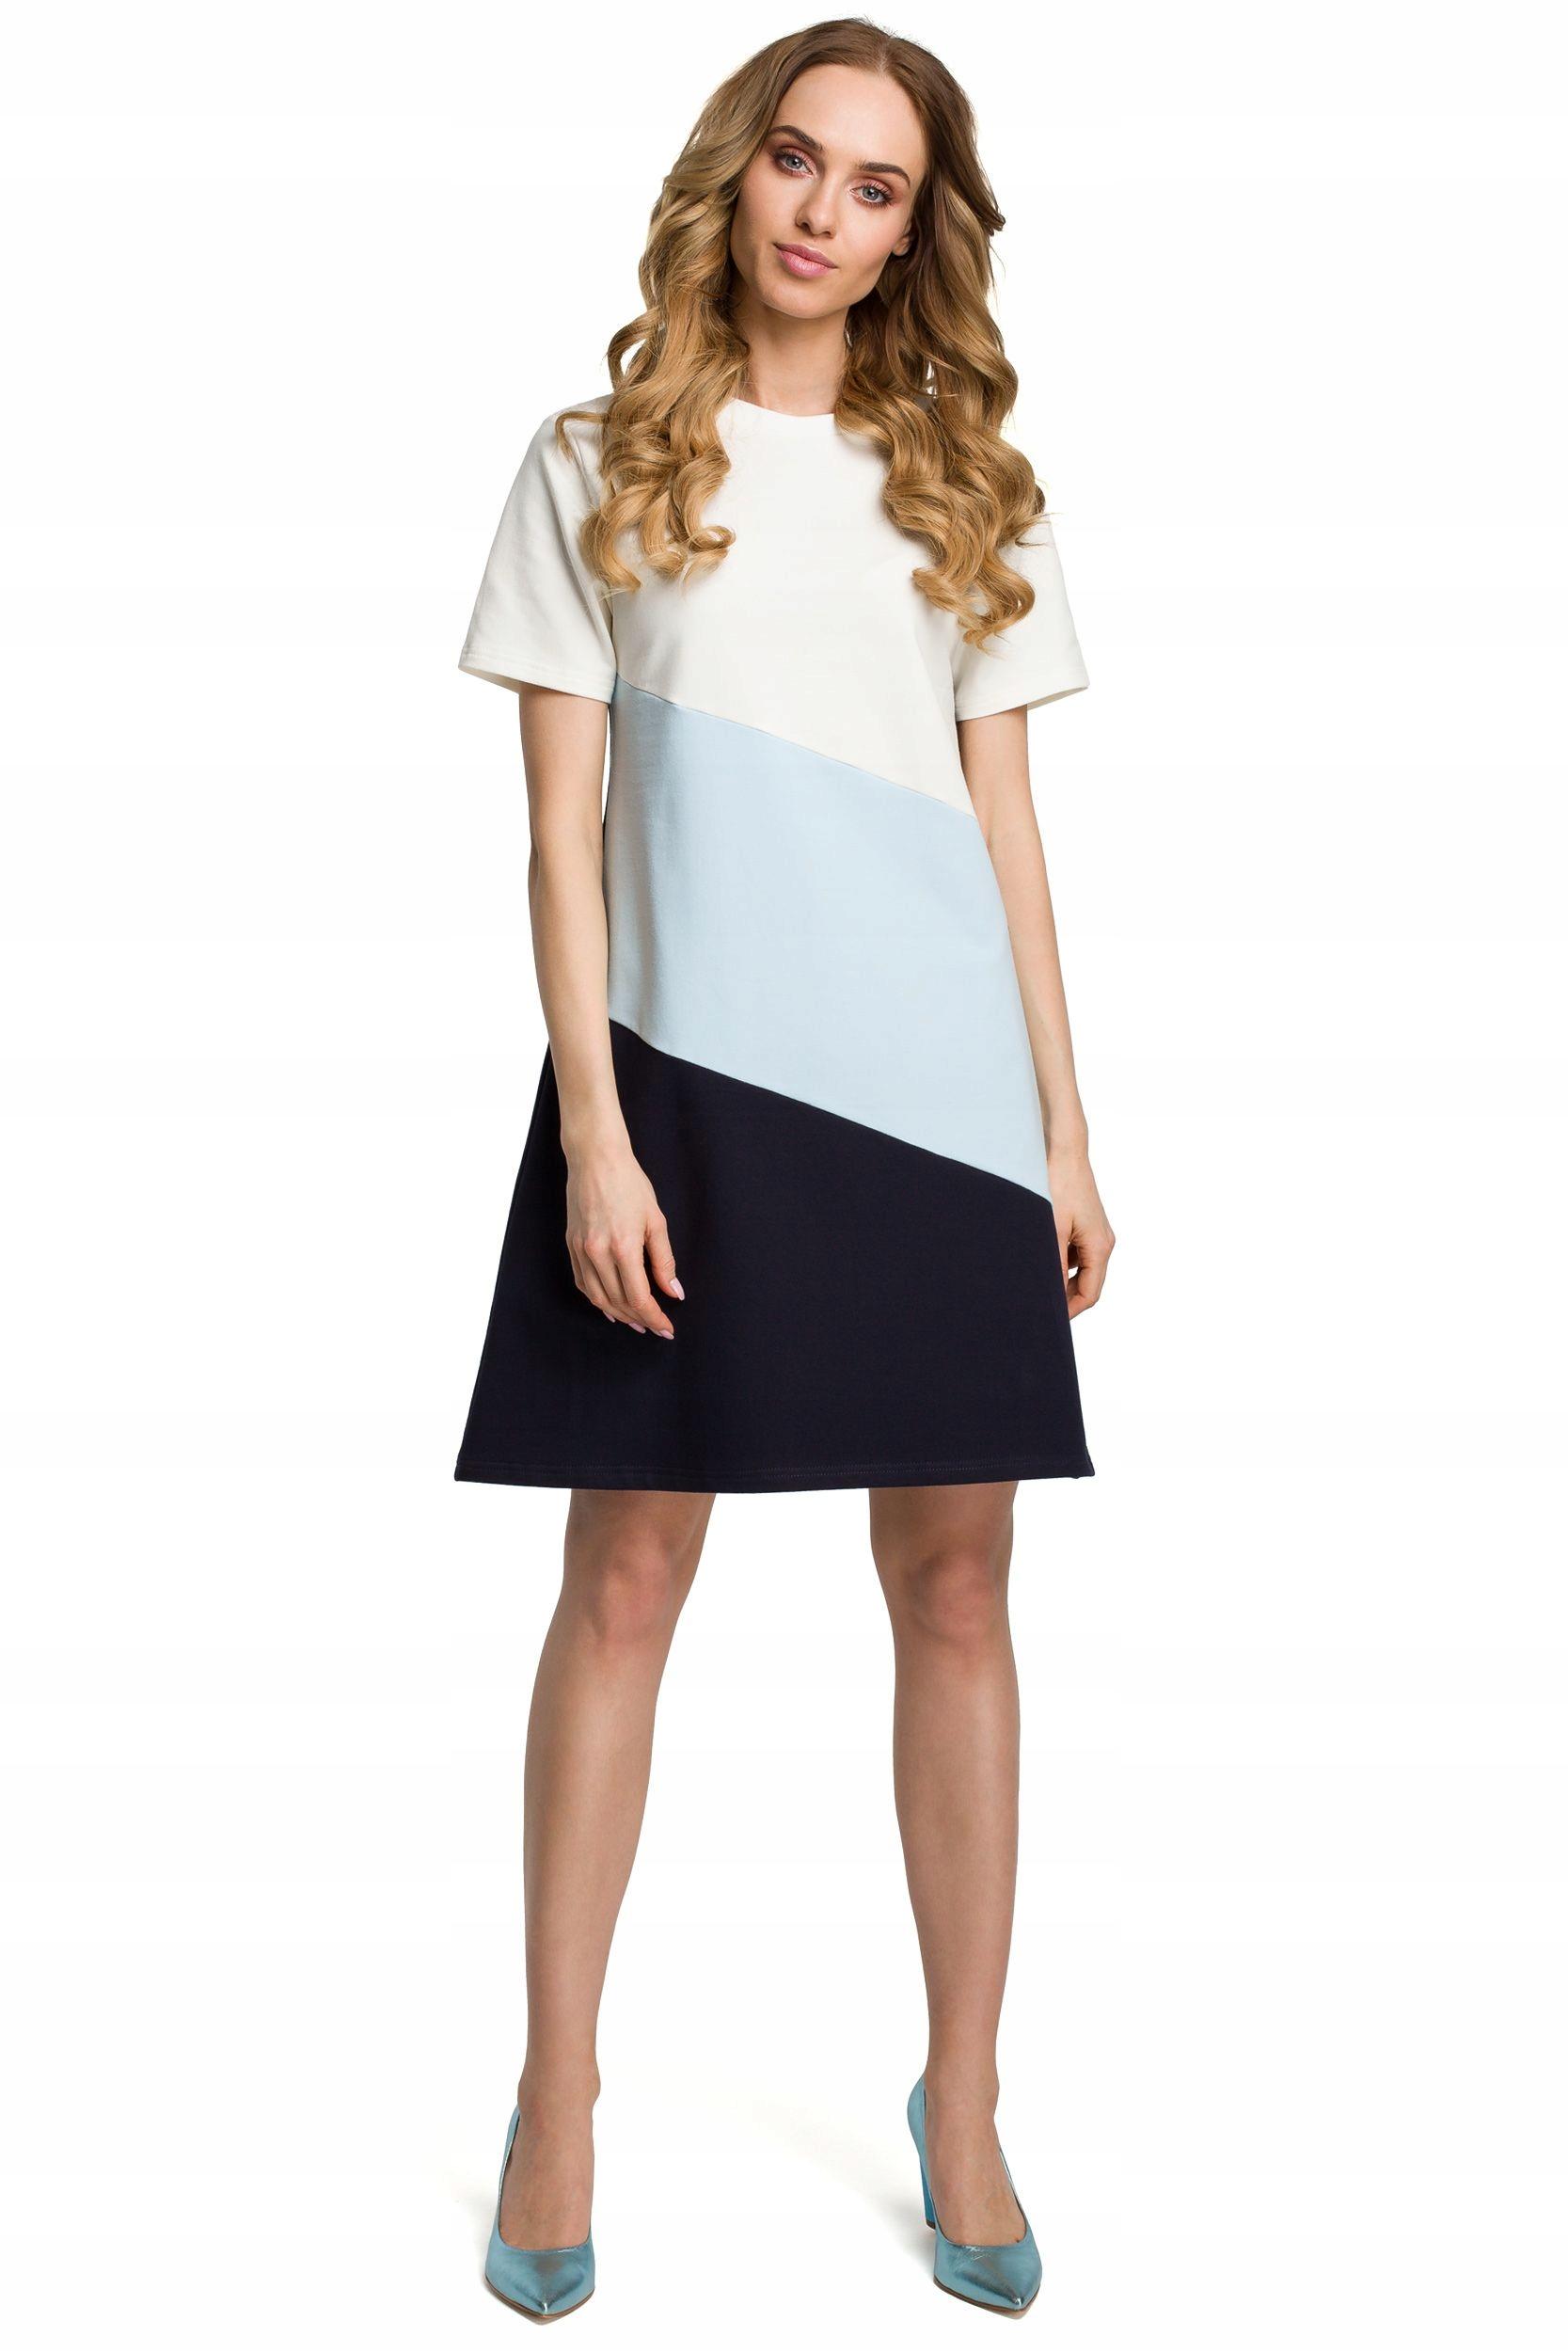 M373 Sukienka mini 3 kolory - błękitna 38   M